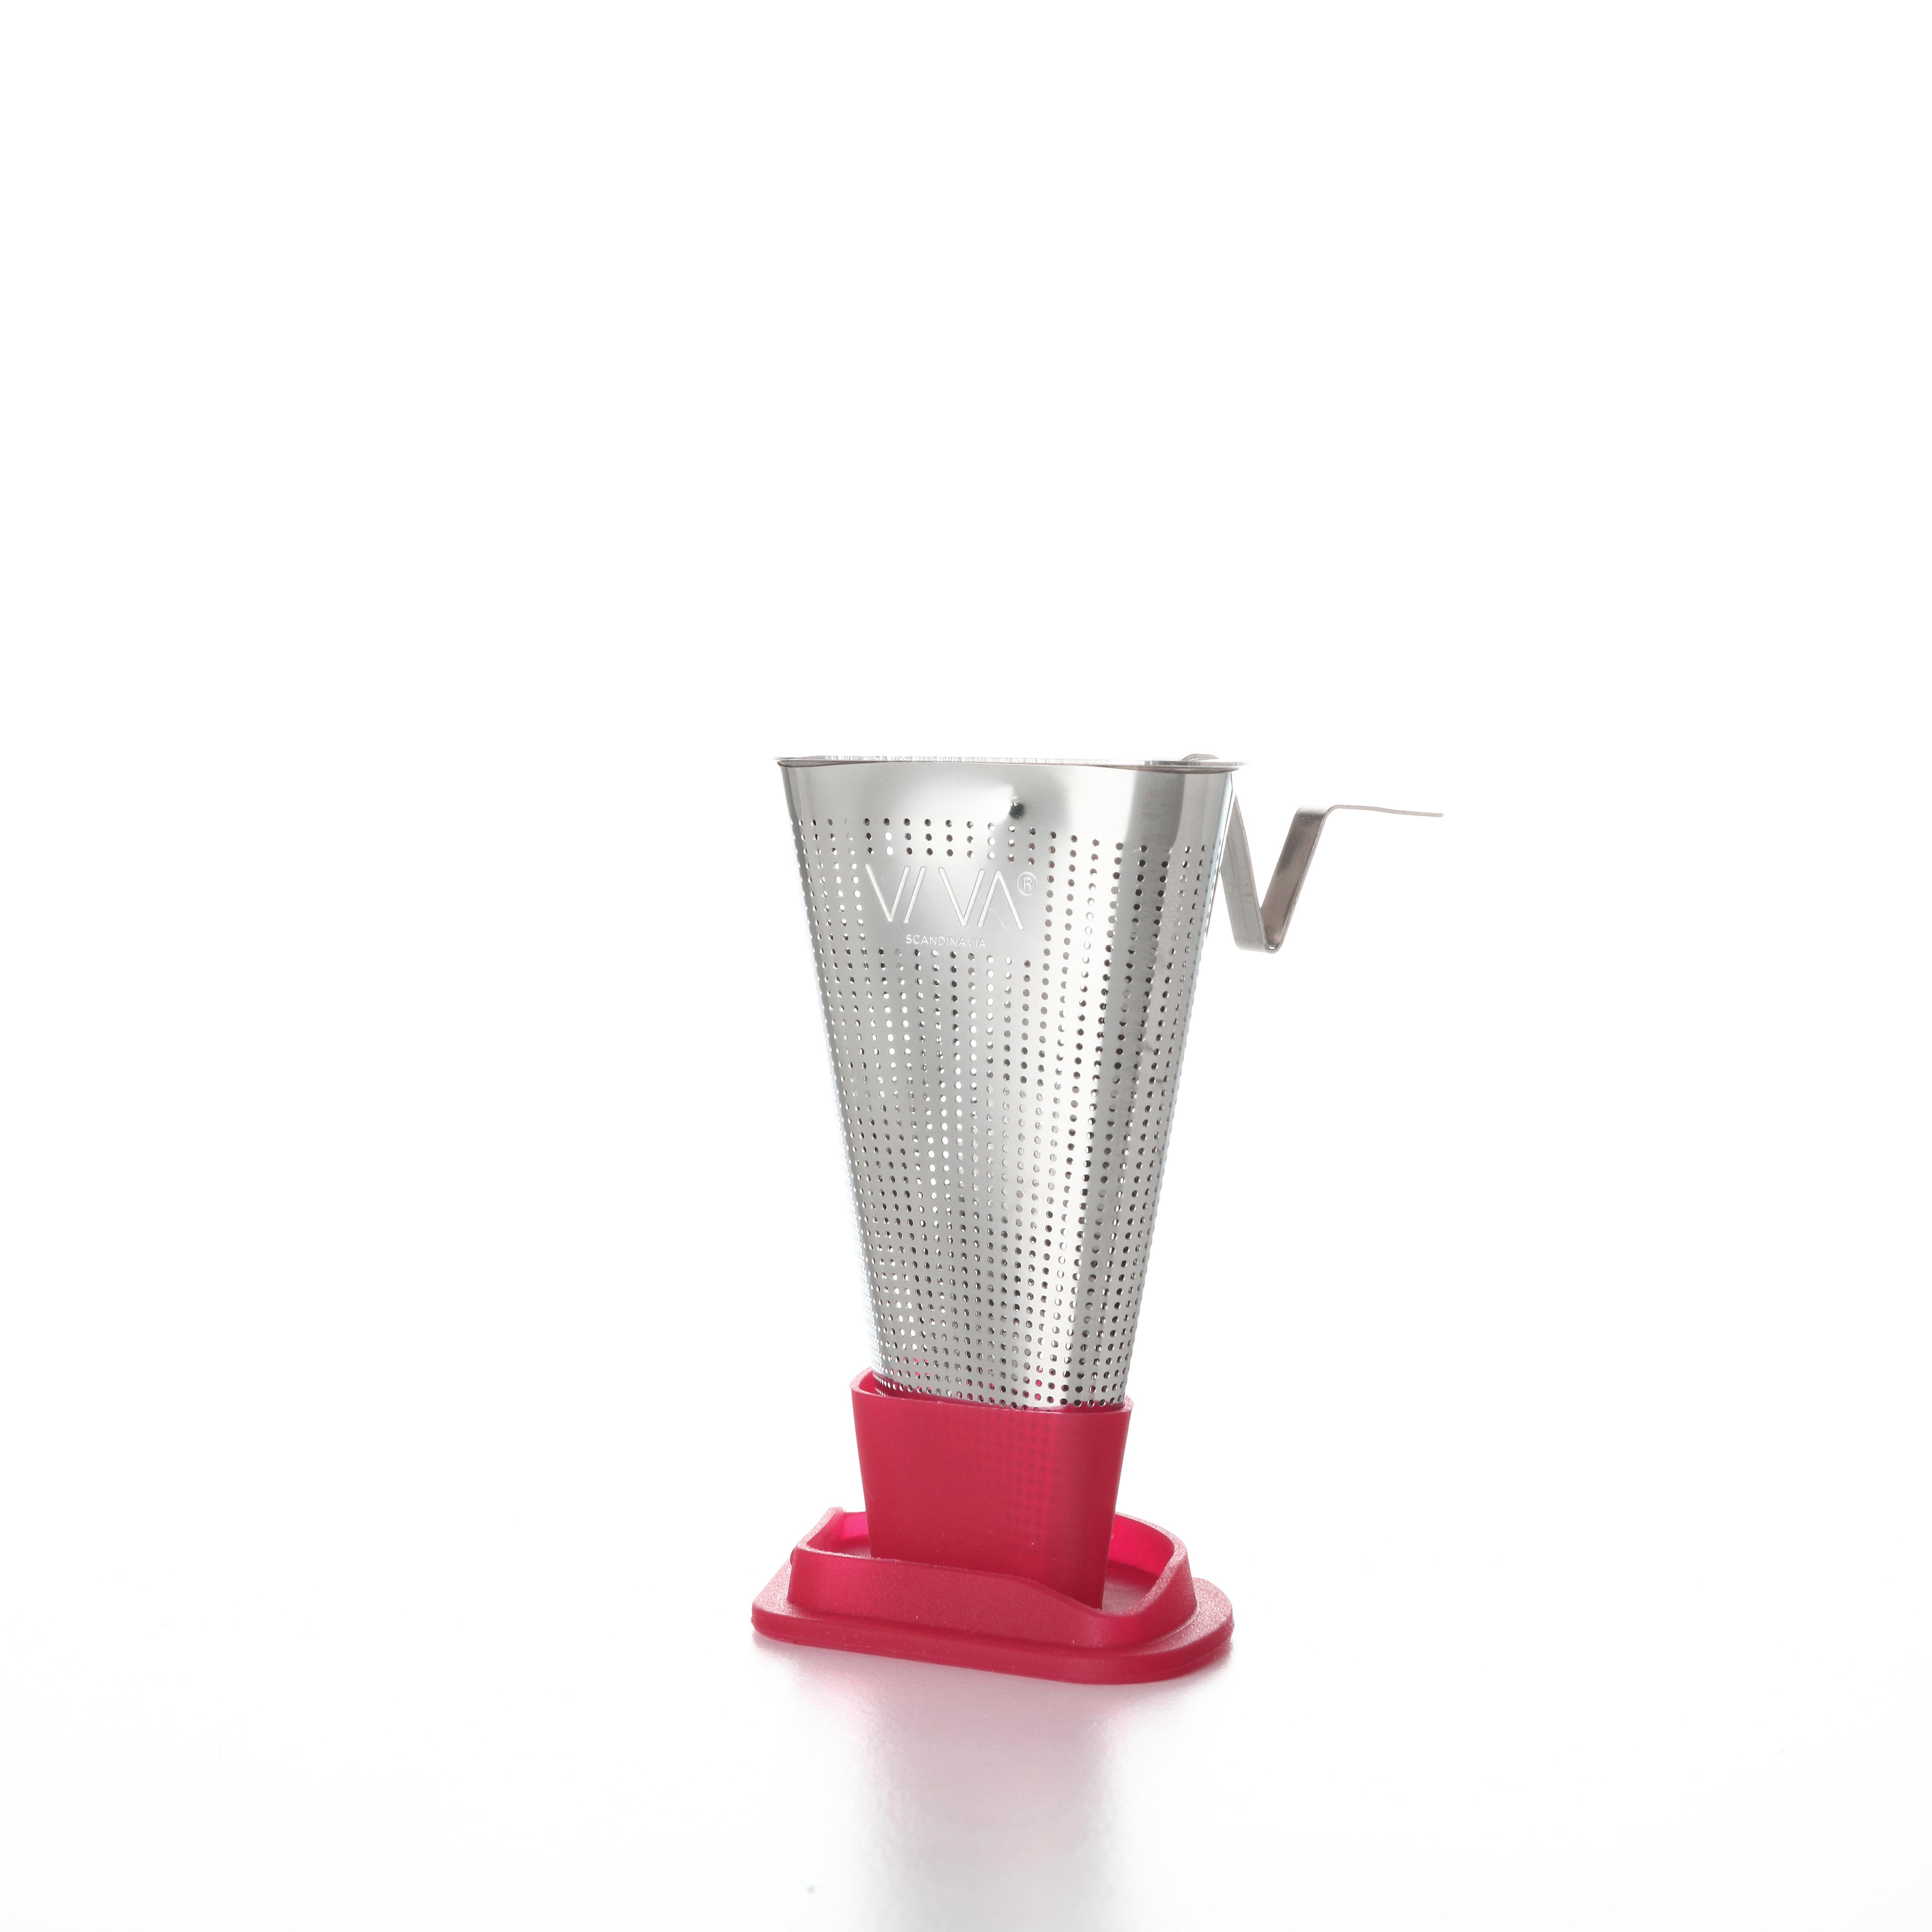 Infusion - Infuseur à thé Anytime - Vrac - Kusmi Tea